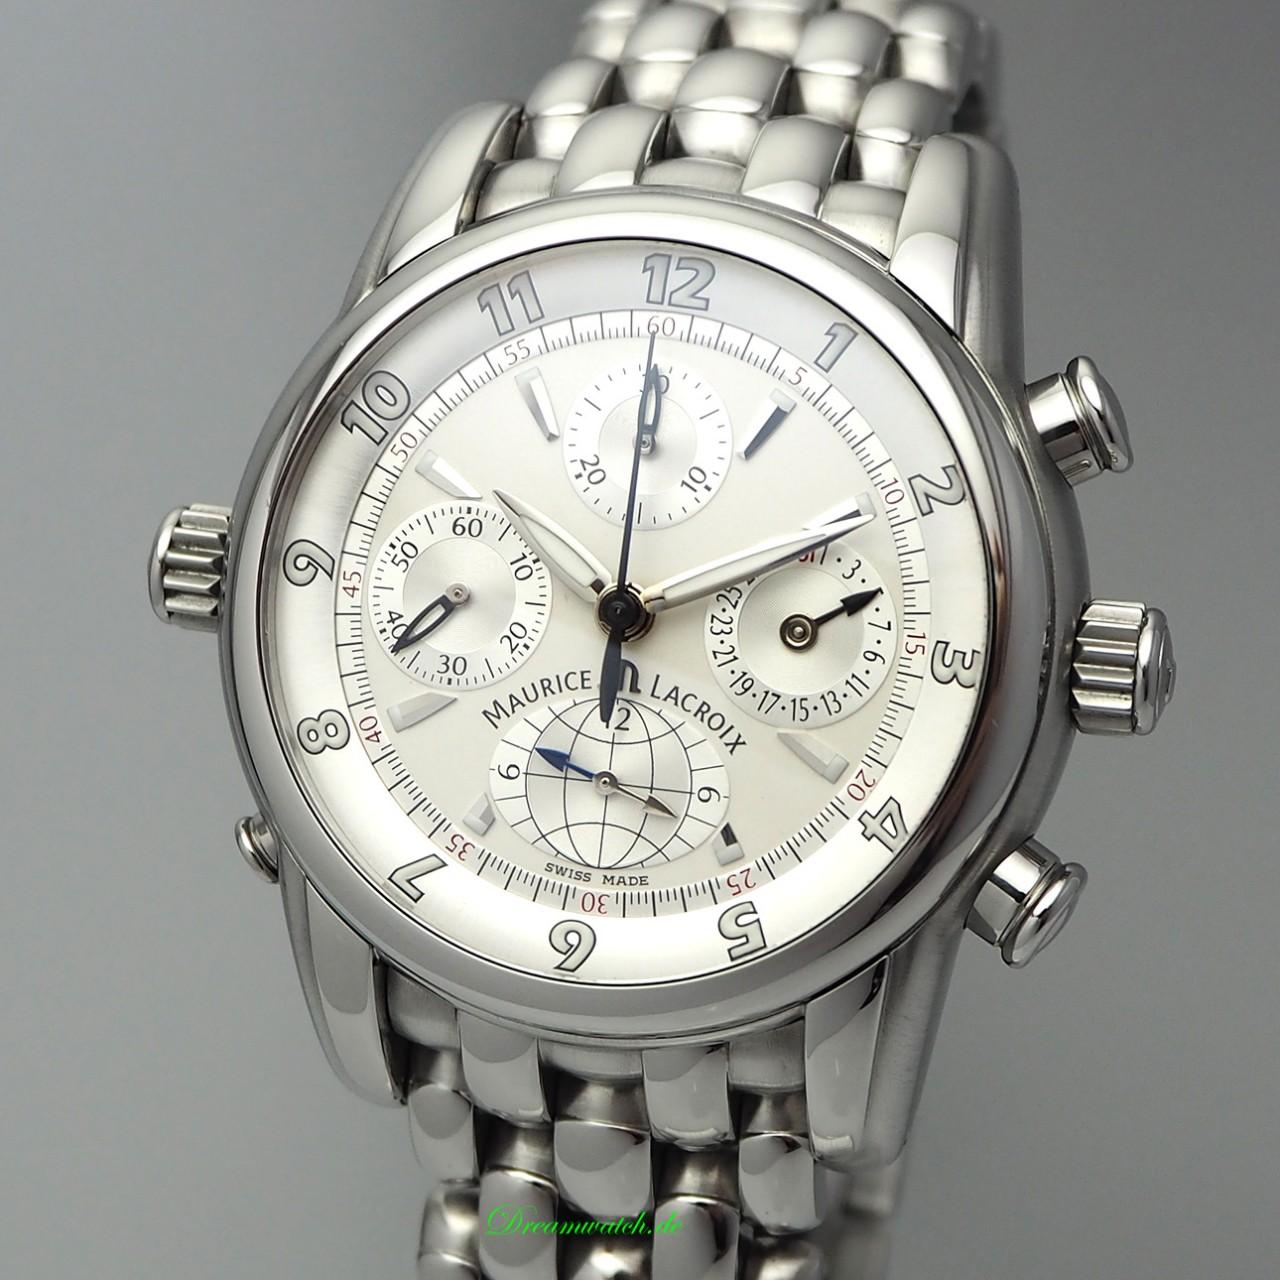 Maurice Lacroix Globe Chronograph -Stahl-Stahl, Box und Papiere TOP